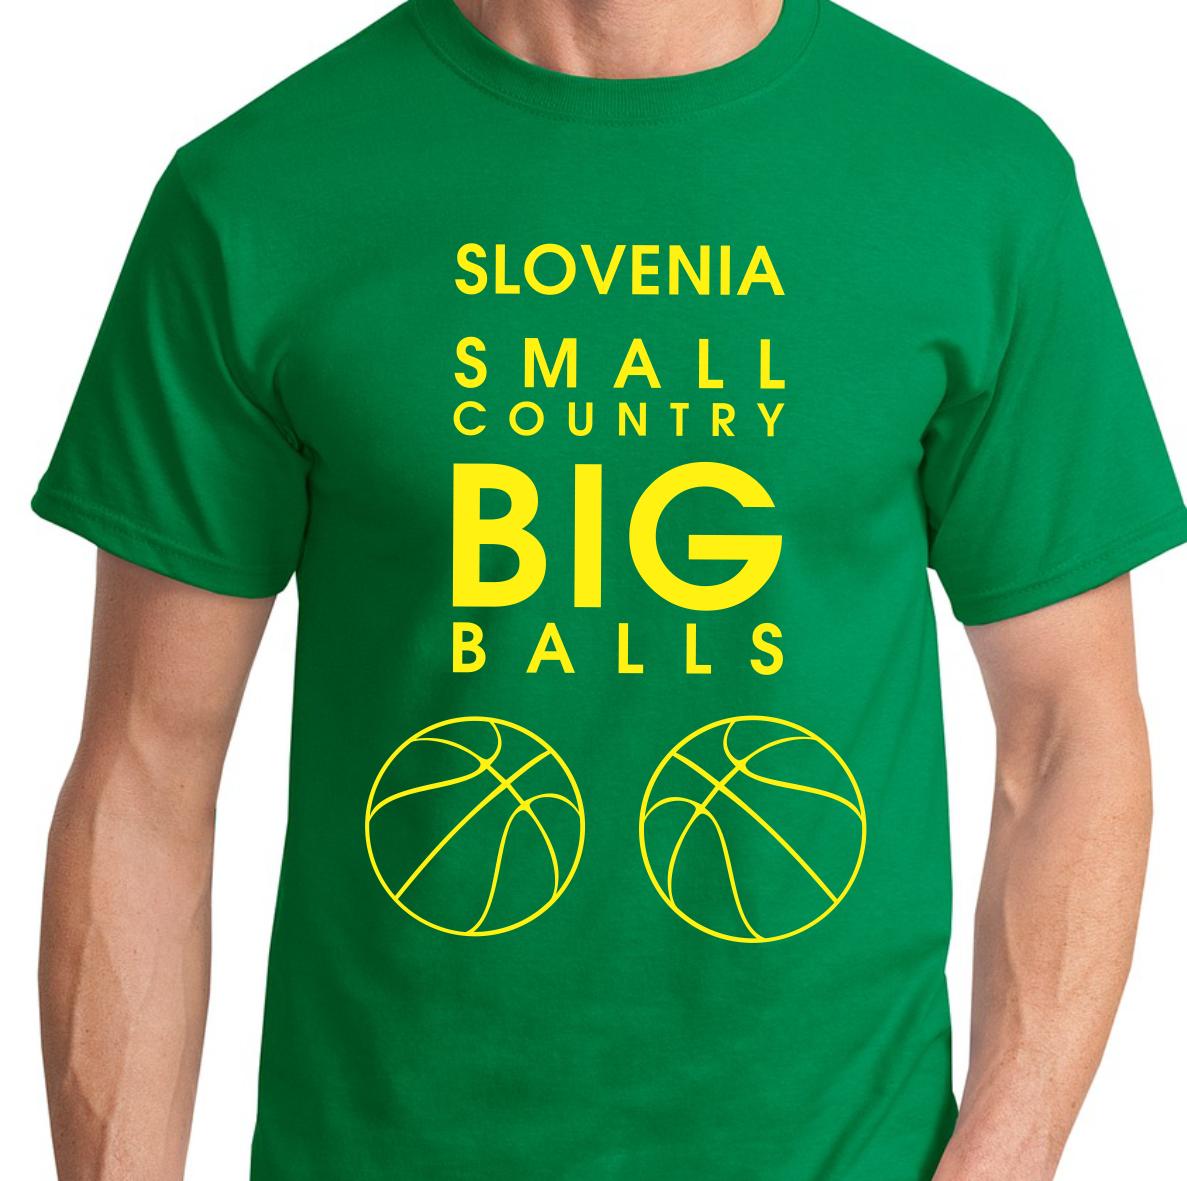 Košarkarska majica Slovenia small country big balls